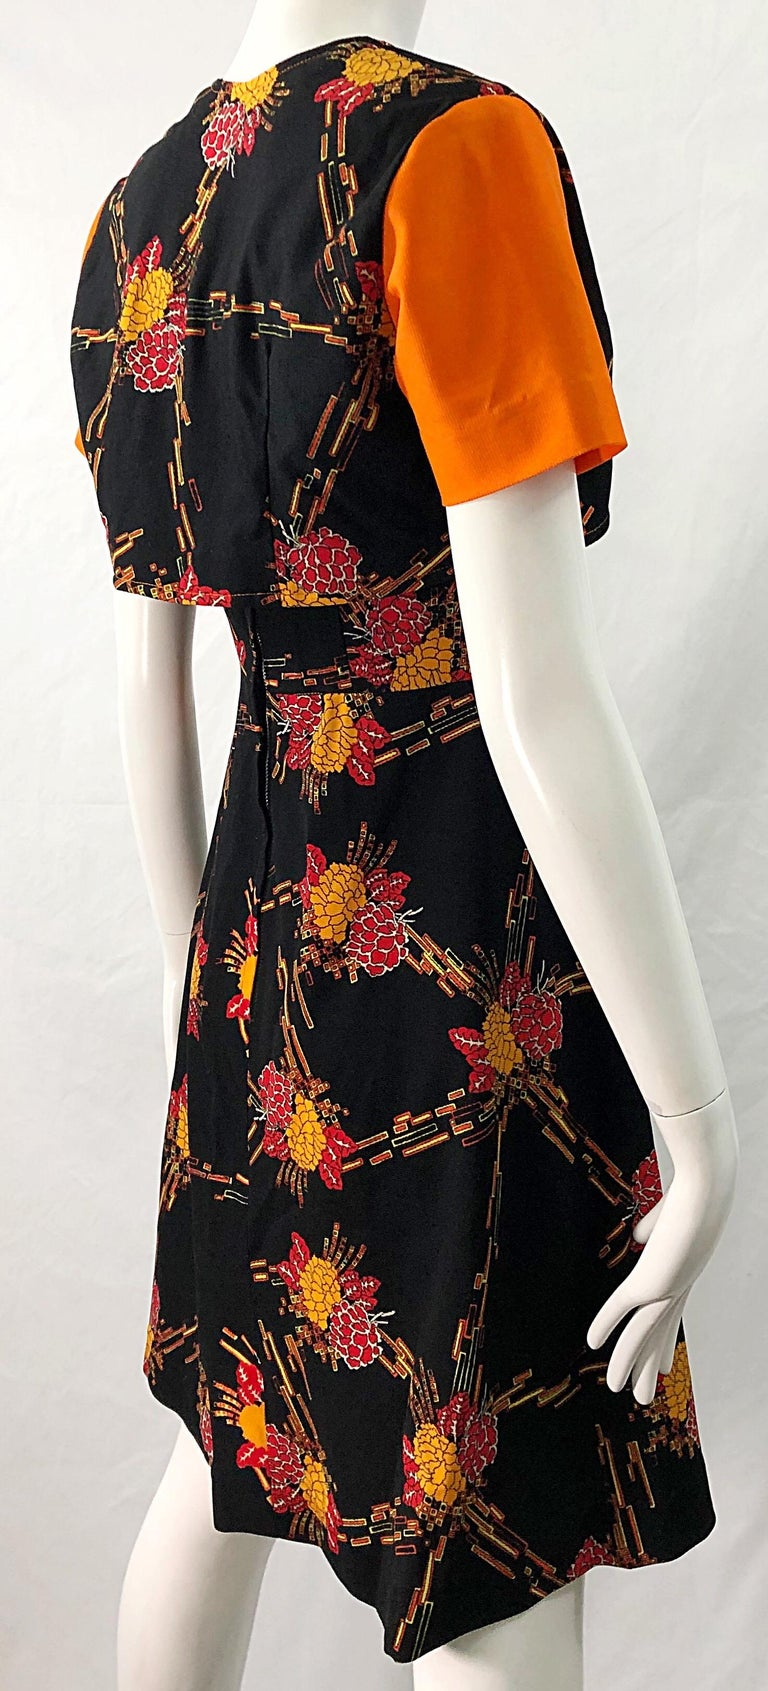 1970s Autumnal Digital Floral Print Knit Vintage 70s A Line Dress + Bolero Top For Sale 6